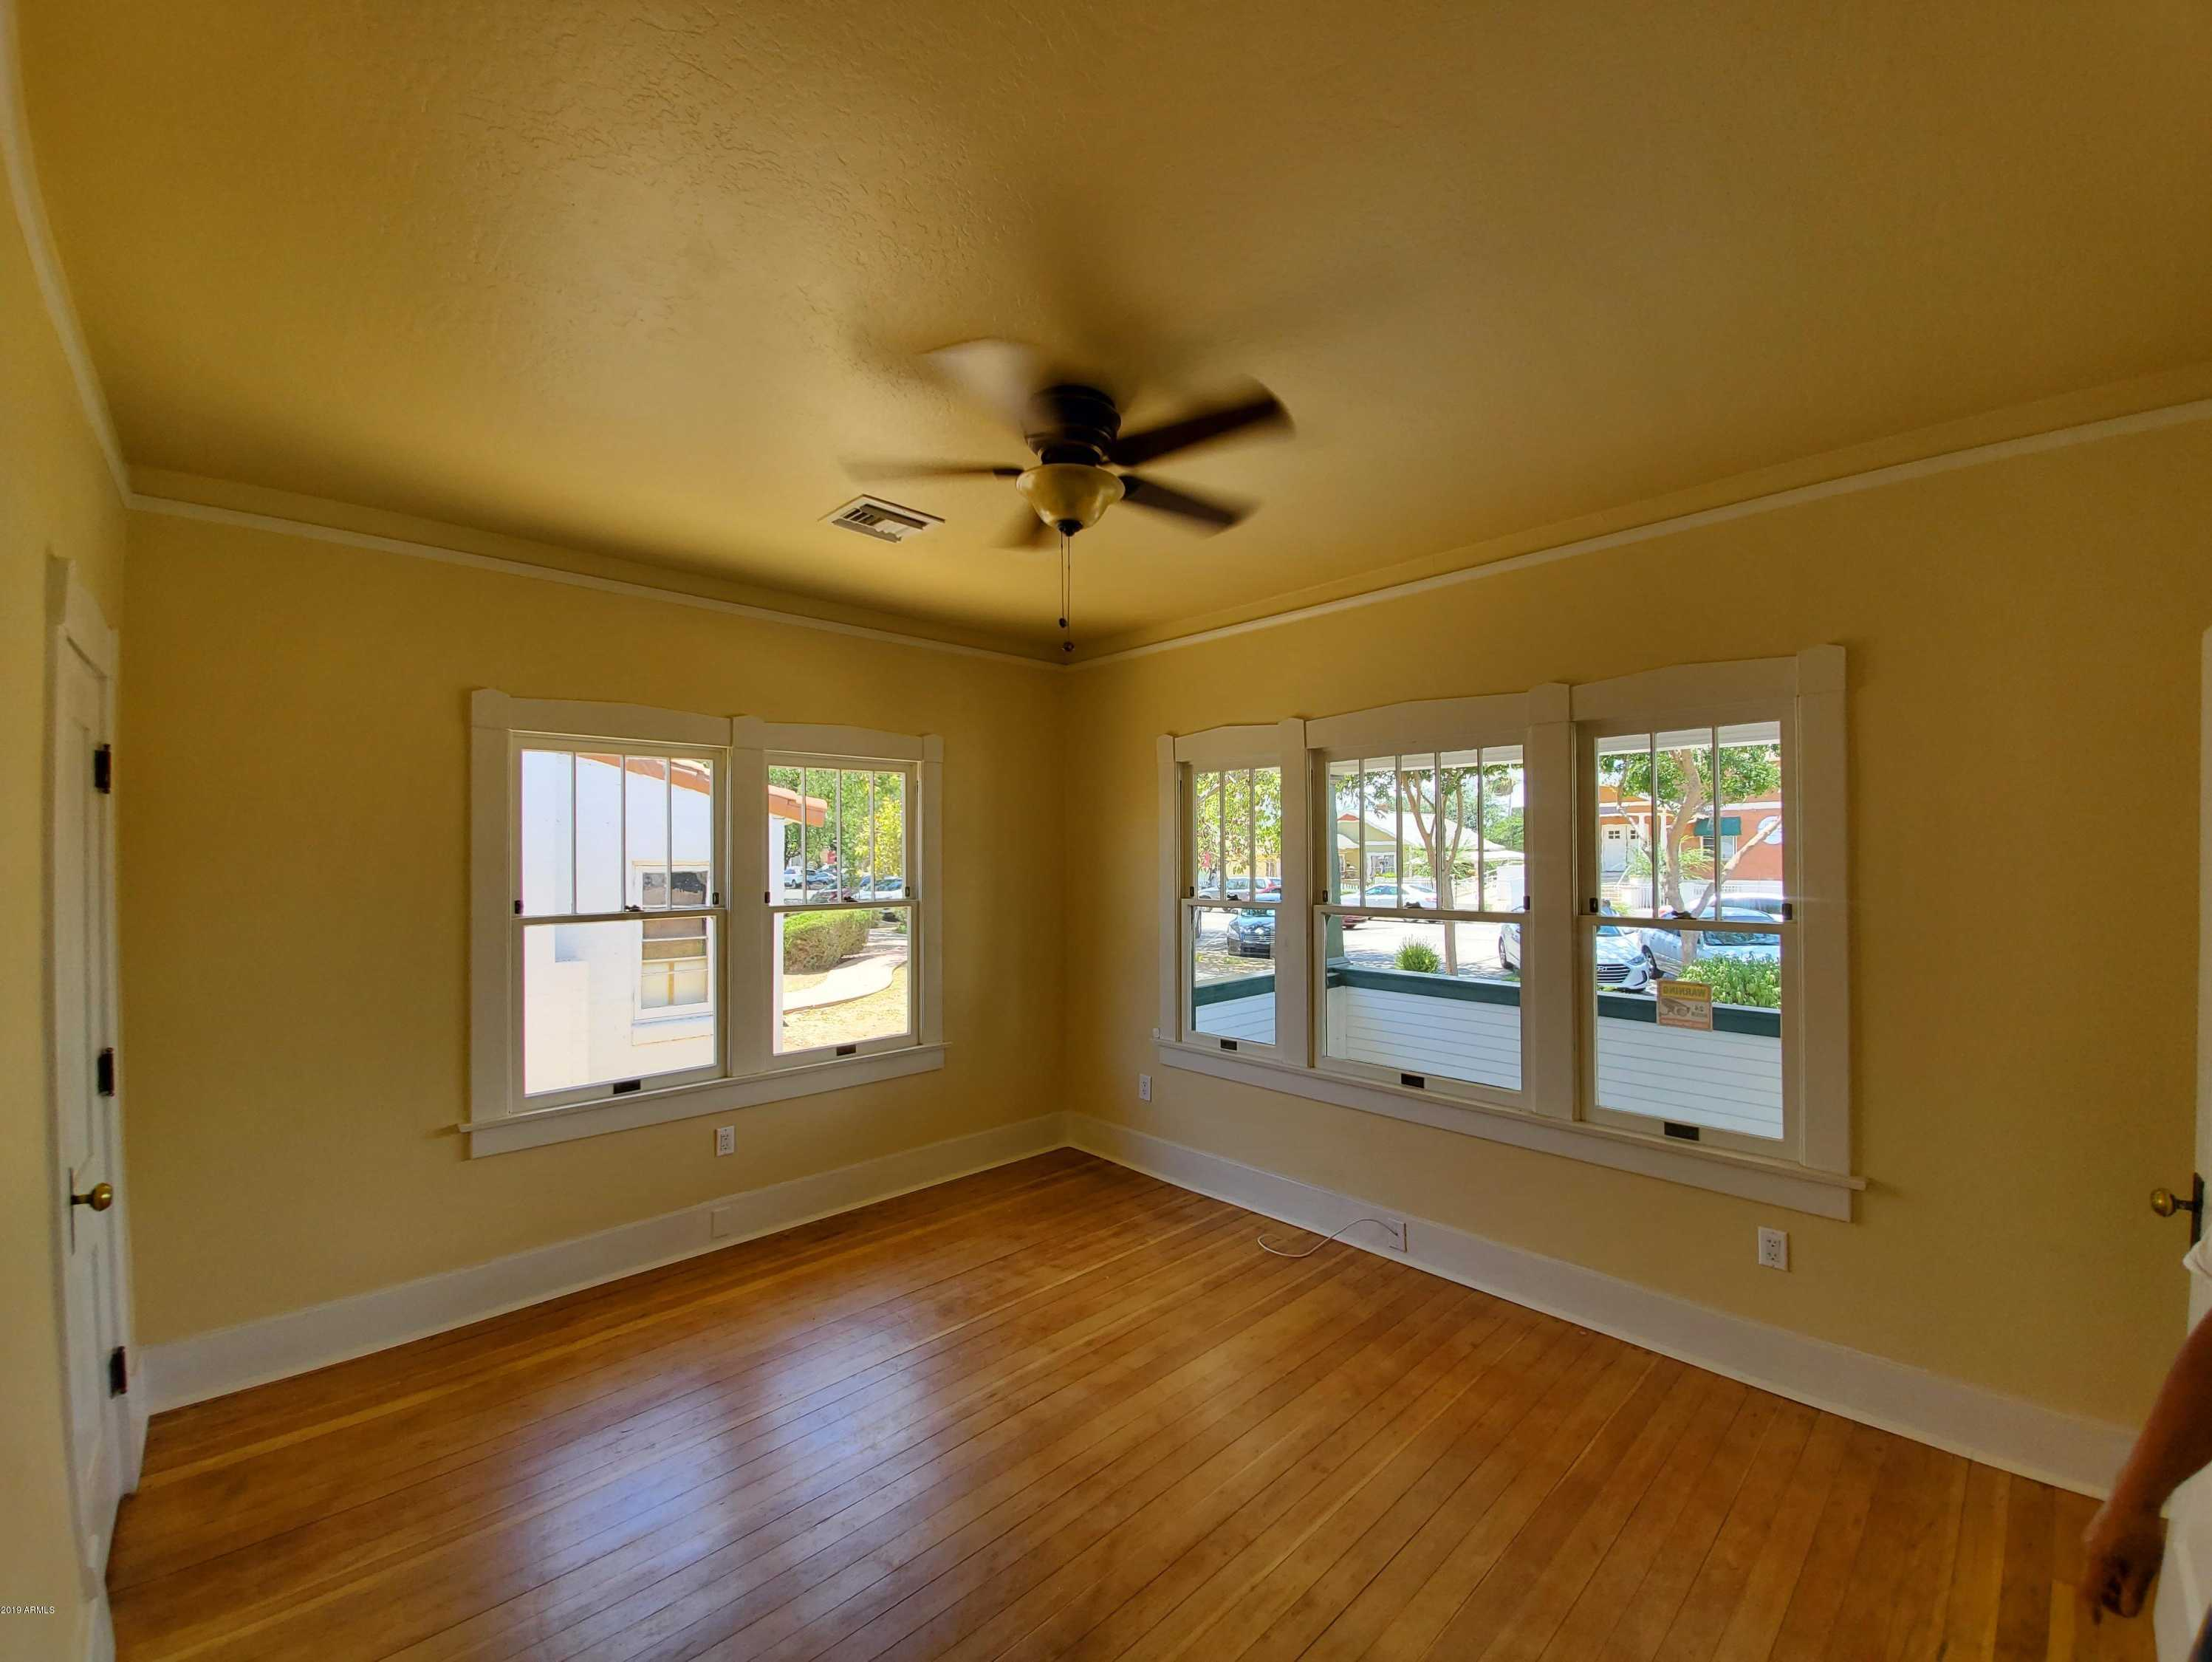 $365,000 - 2Br/2Ba - Home for Sale in Glendale Blks 26-28, Glendale